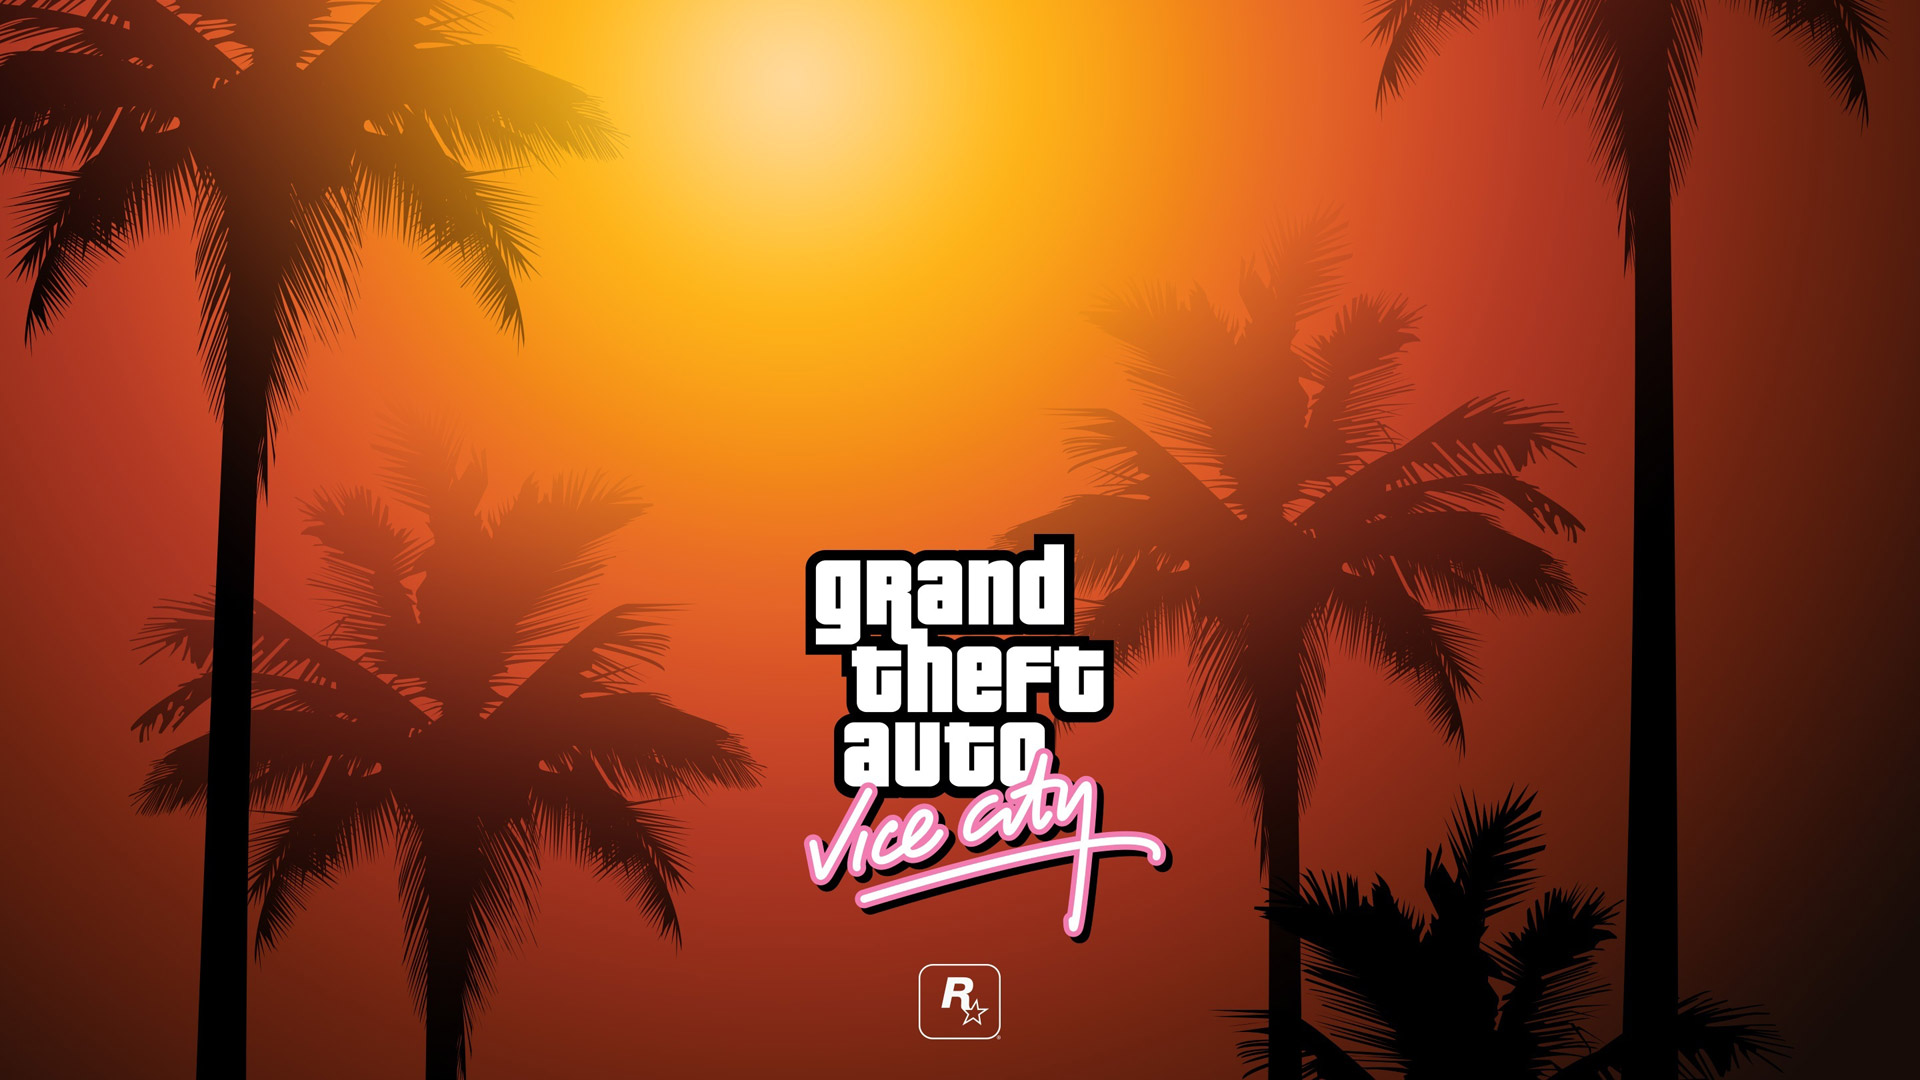 Free Grand Theft Auto: Vice City Wallpaper in 1920x1080